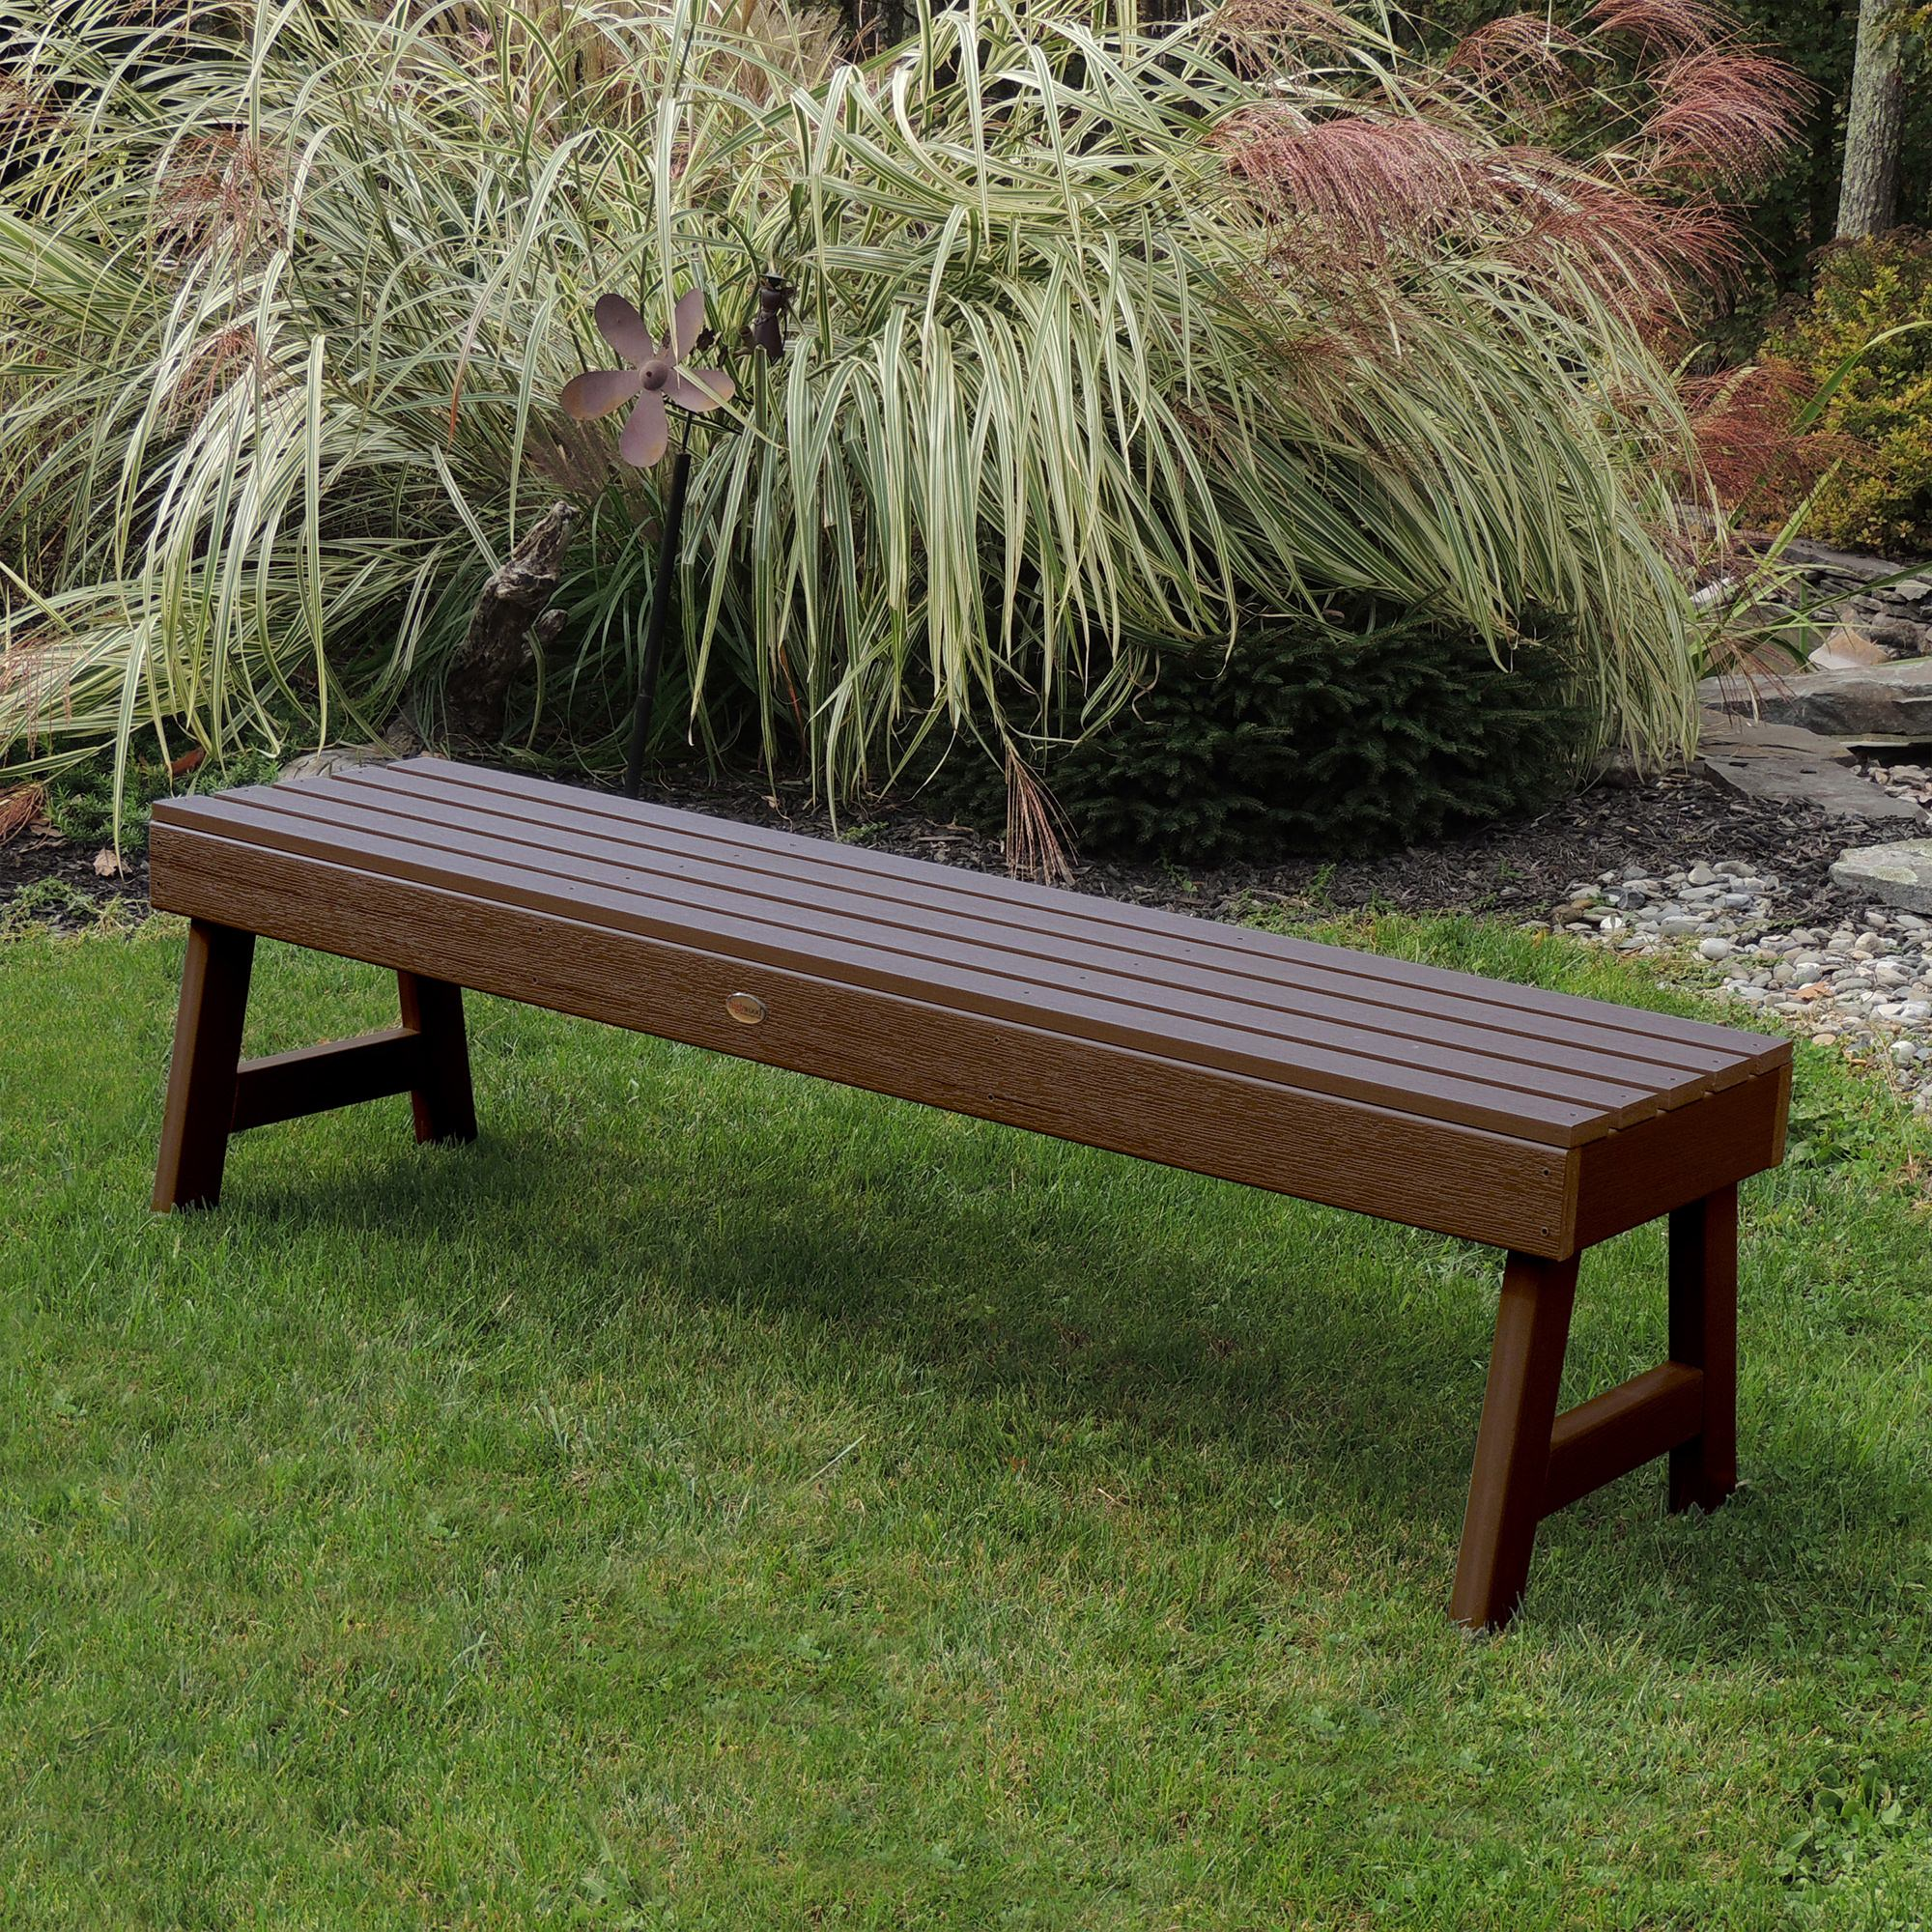 Highwood Weatherly Picnic Bench 5ft